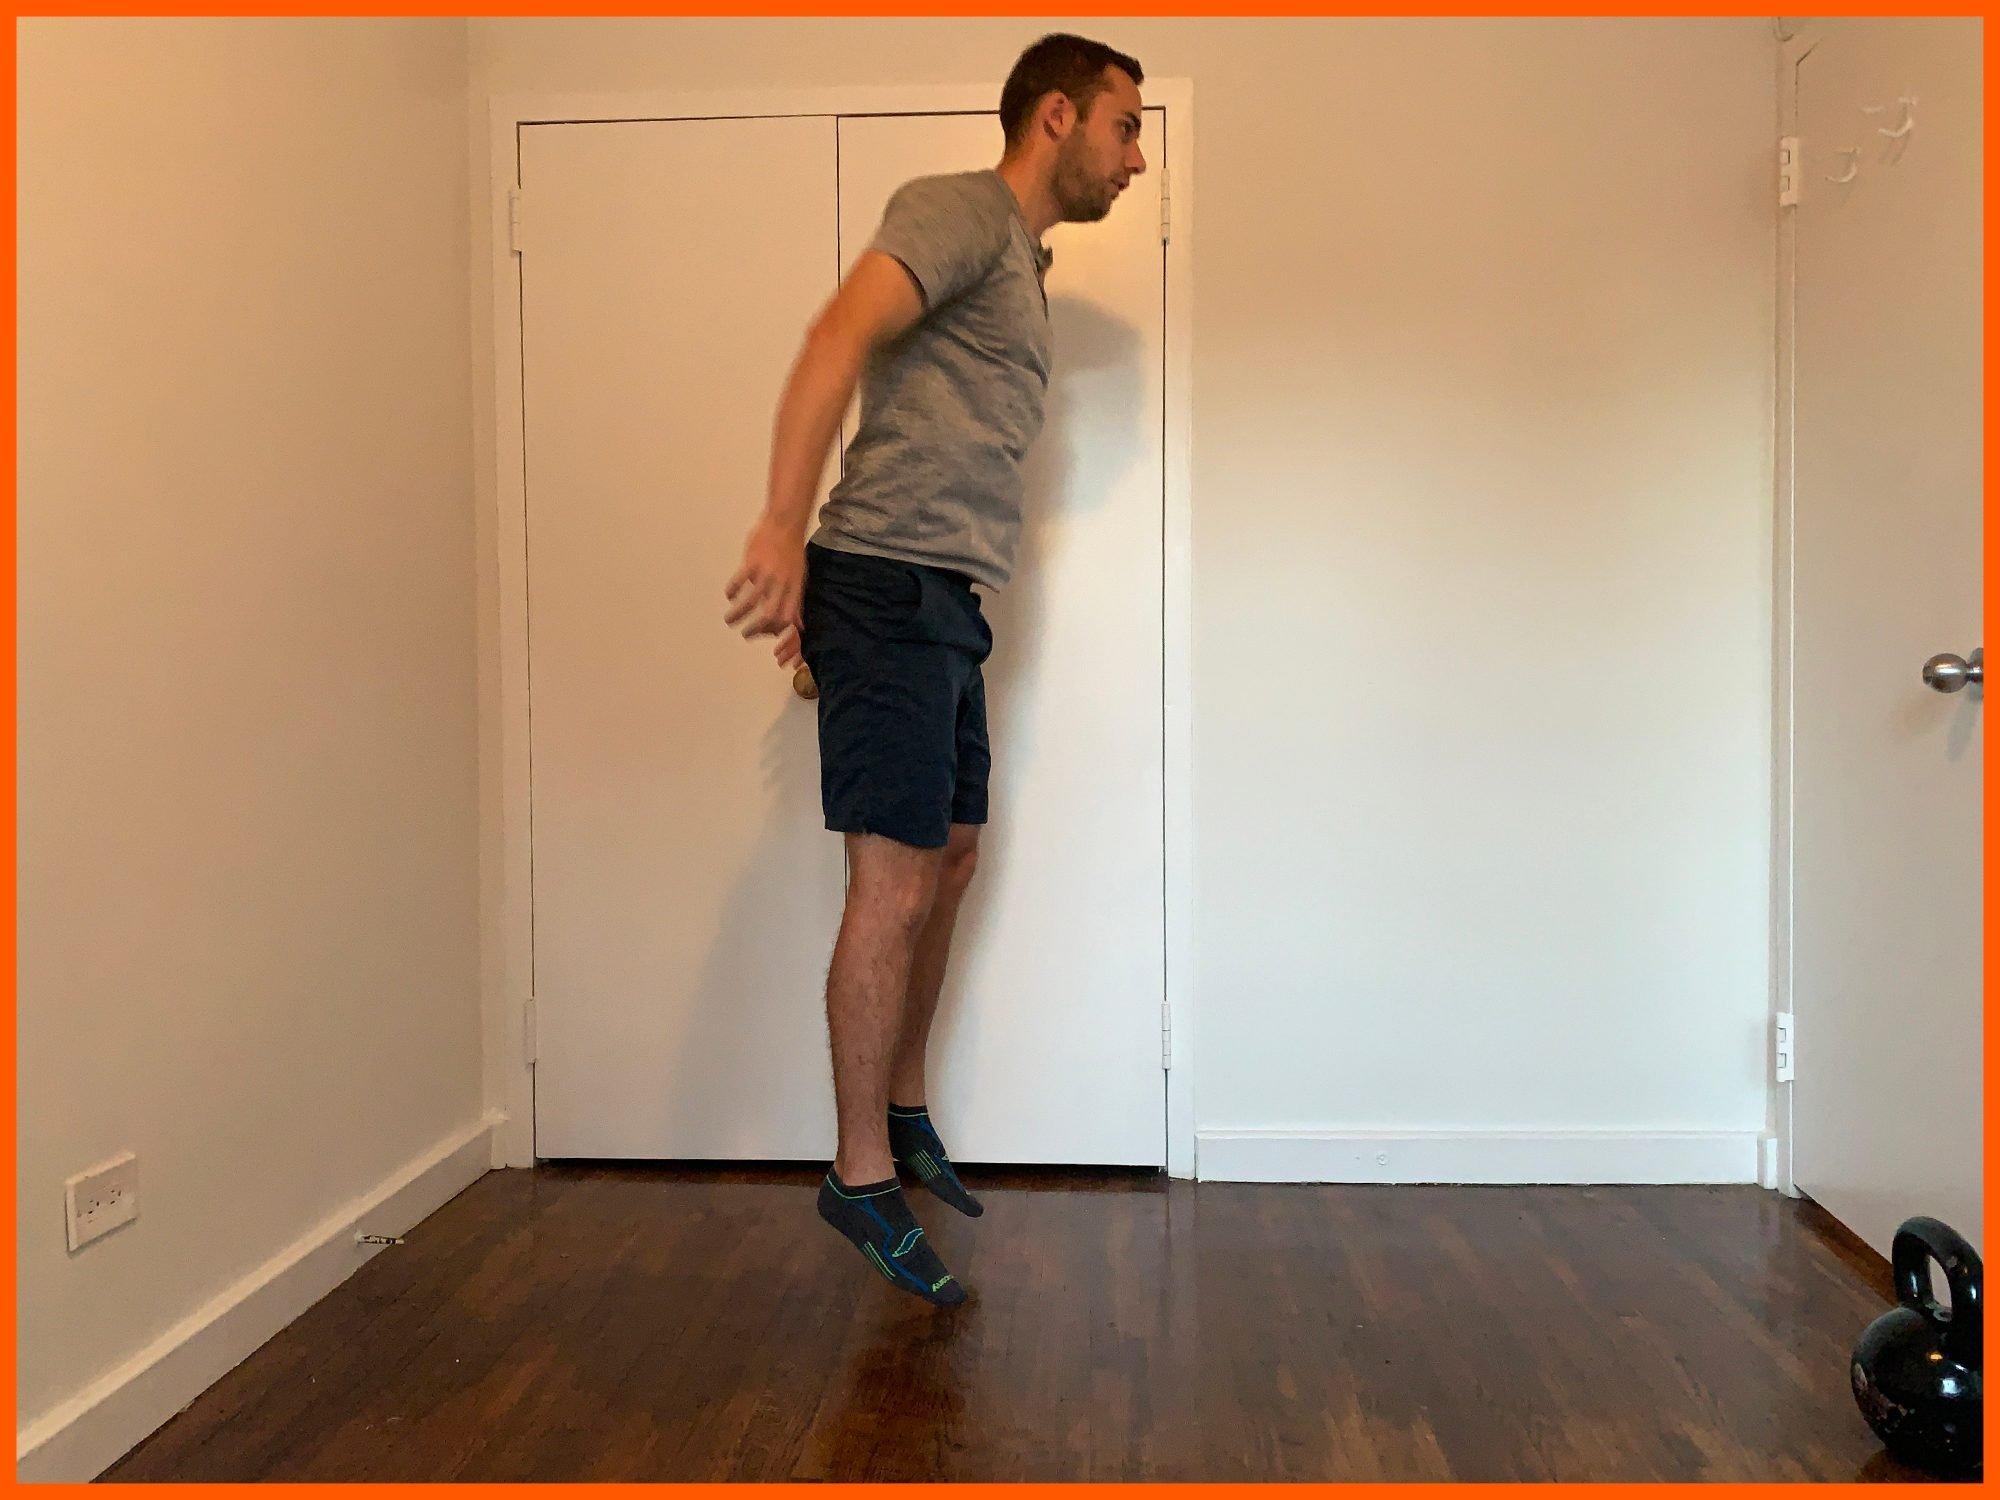 henry halse jump squat exercise